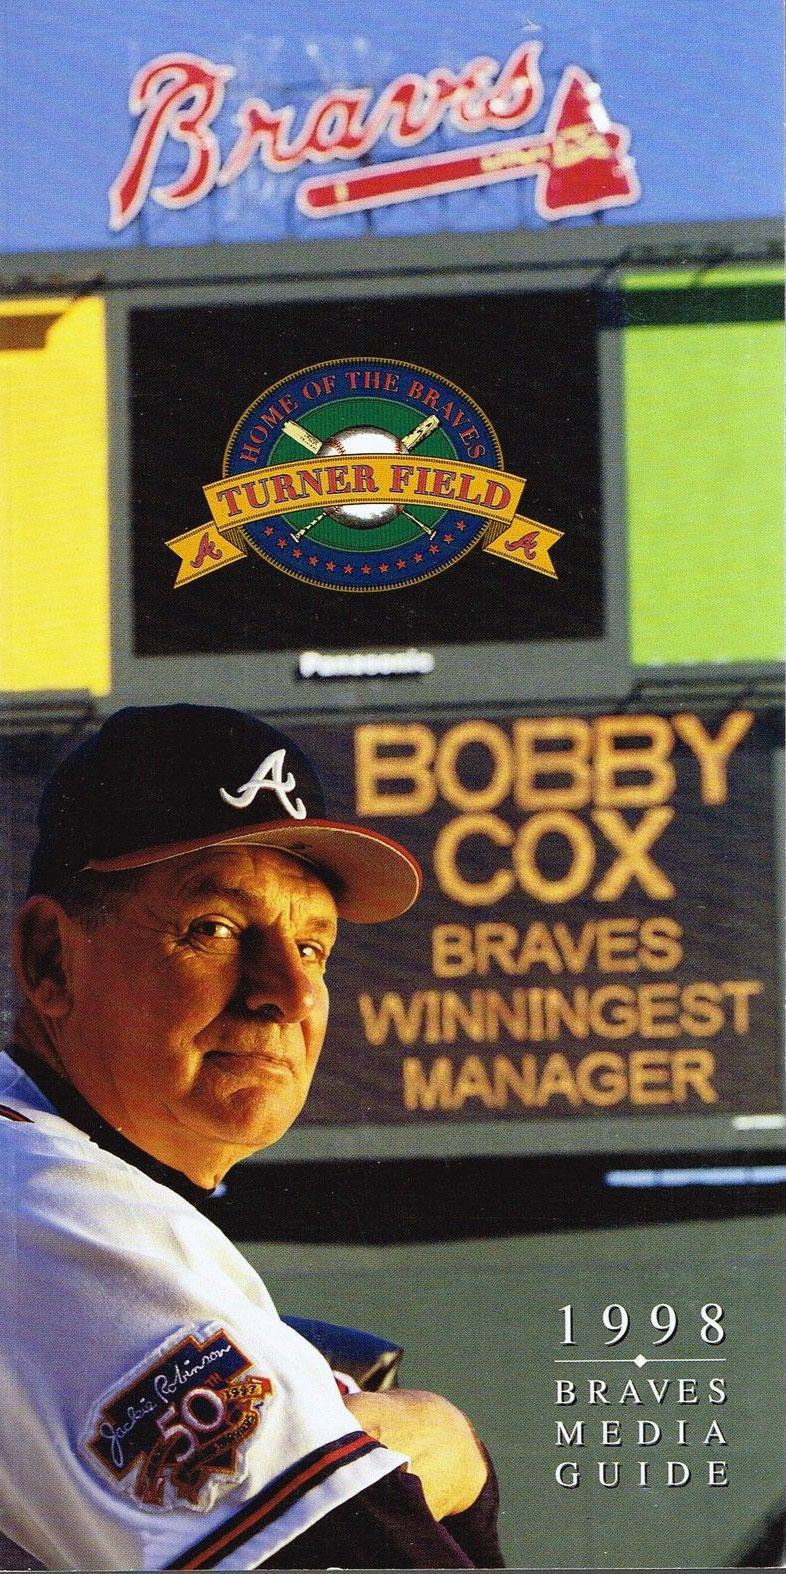 Atlanta Braves Media Guide Media Guide (1998) -  SportsLogos.Net